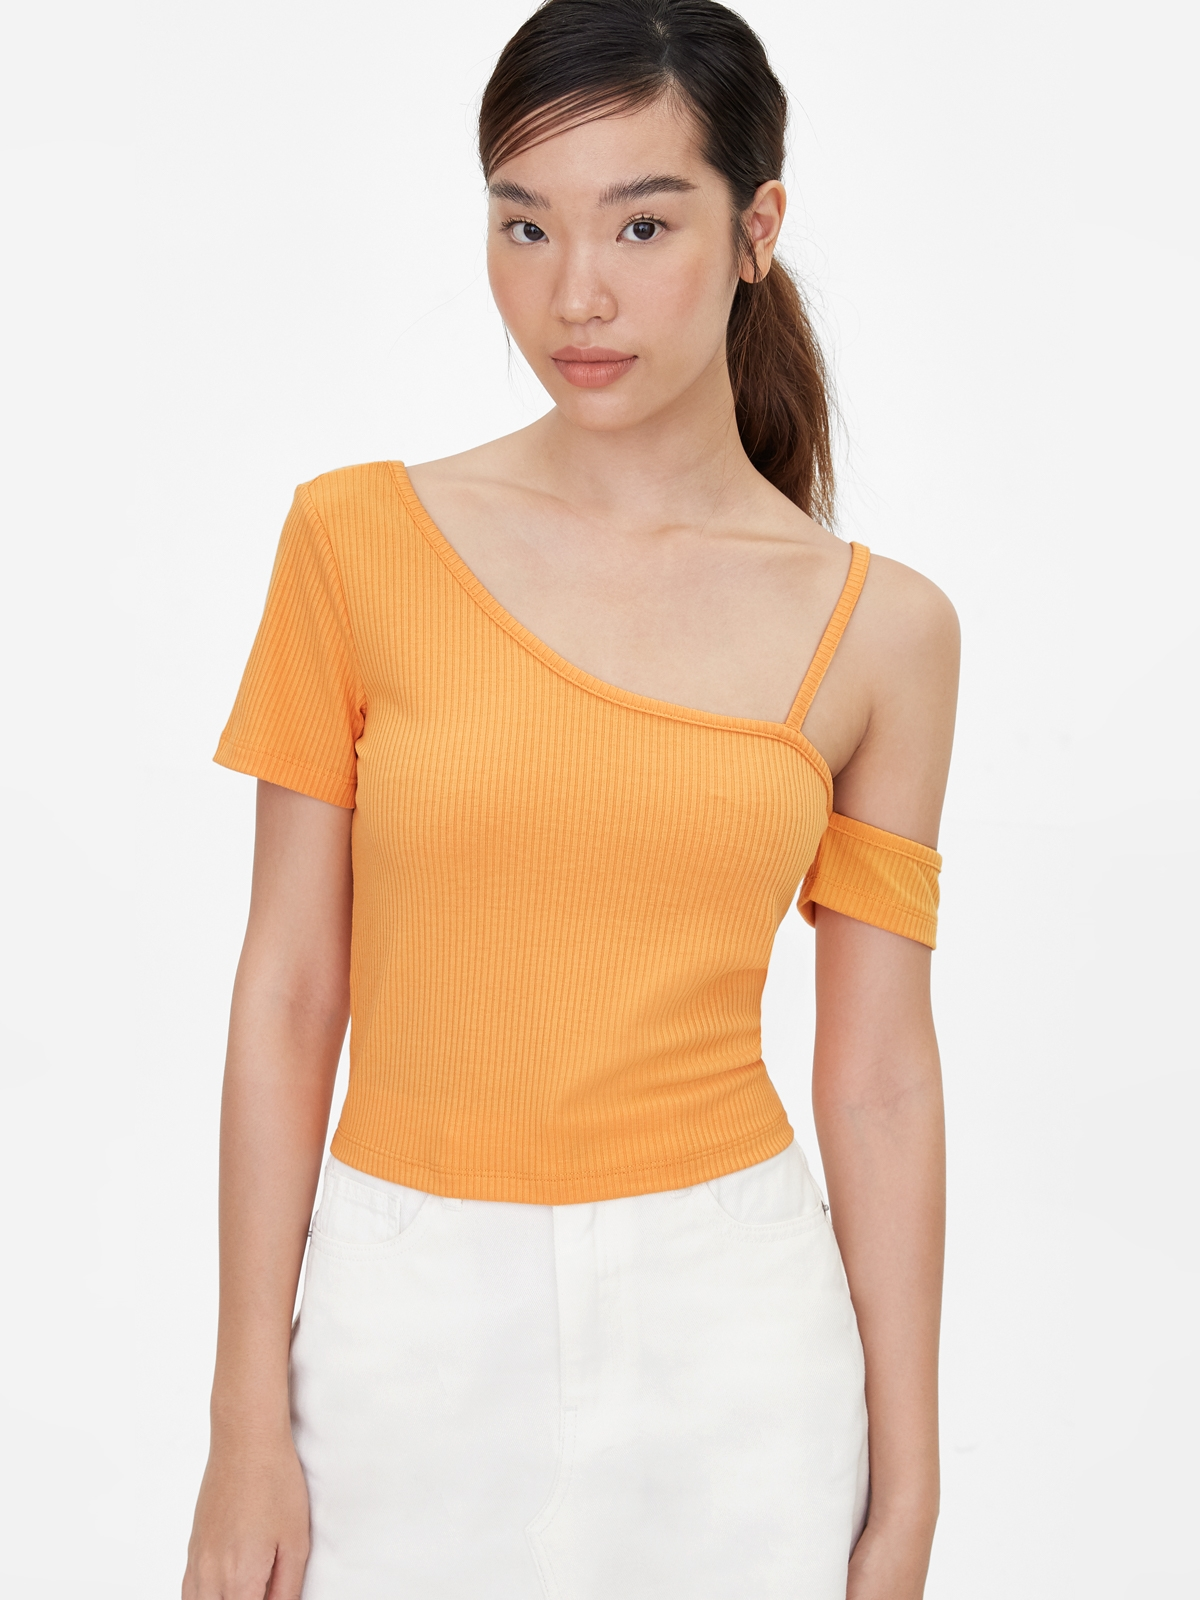 One Shoulder Strap Crop Top Orange